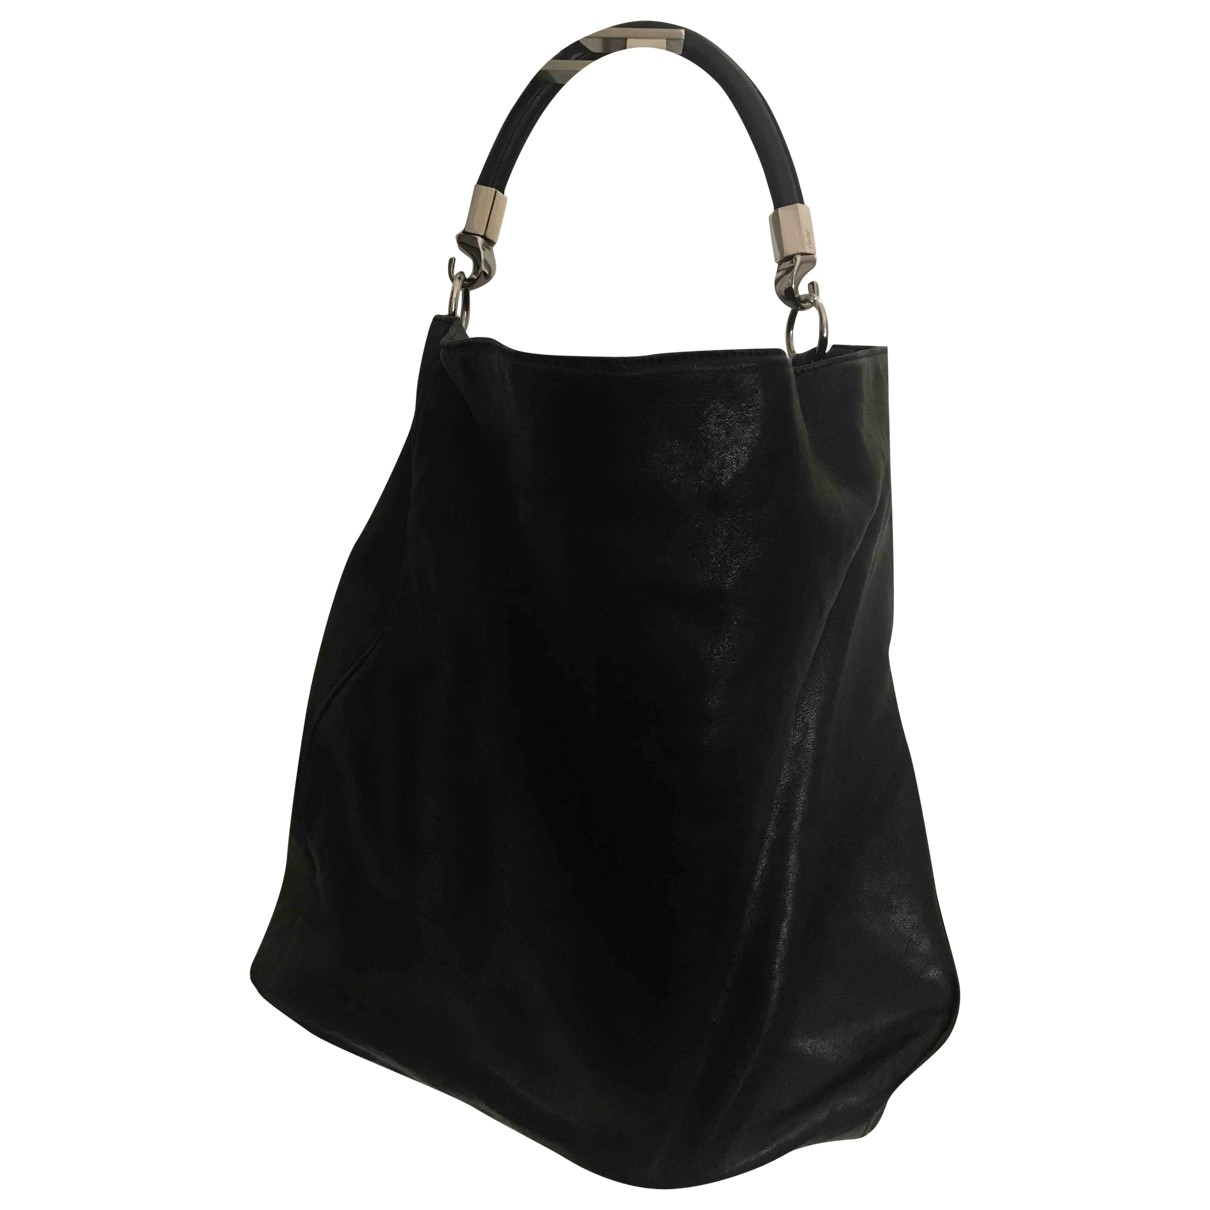 Yves Saint Laurent Roady Handtasche in  Schwarz Leder